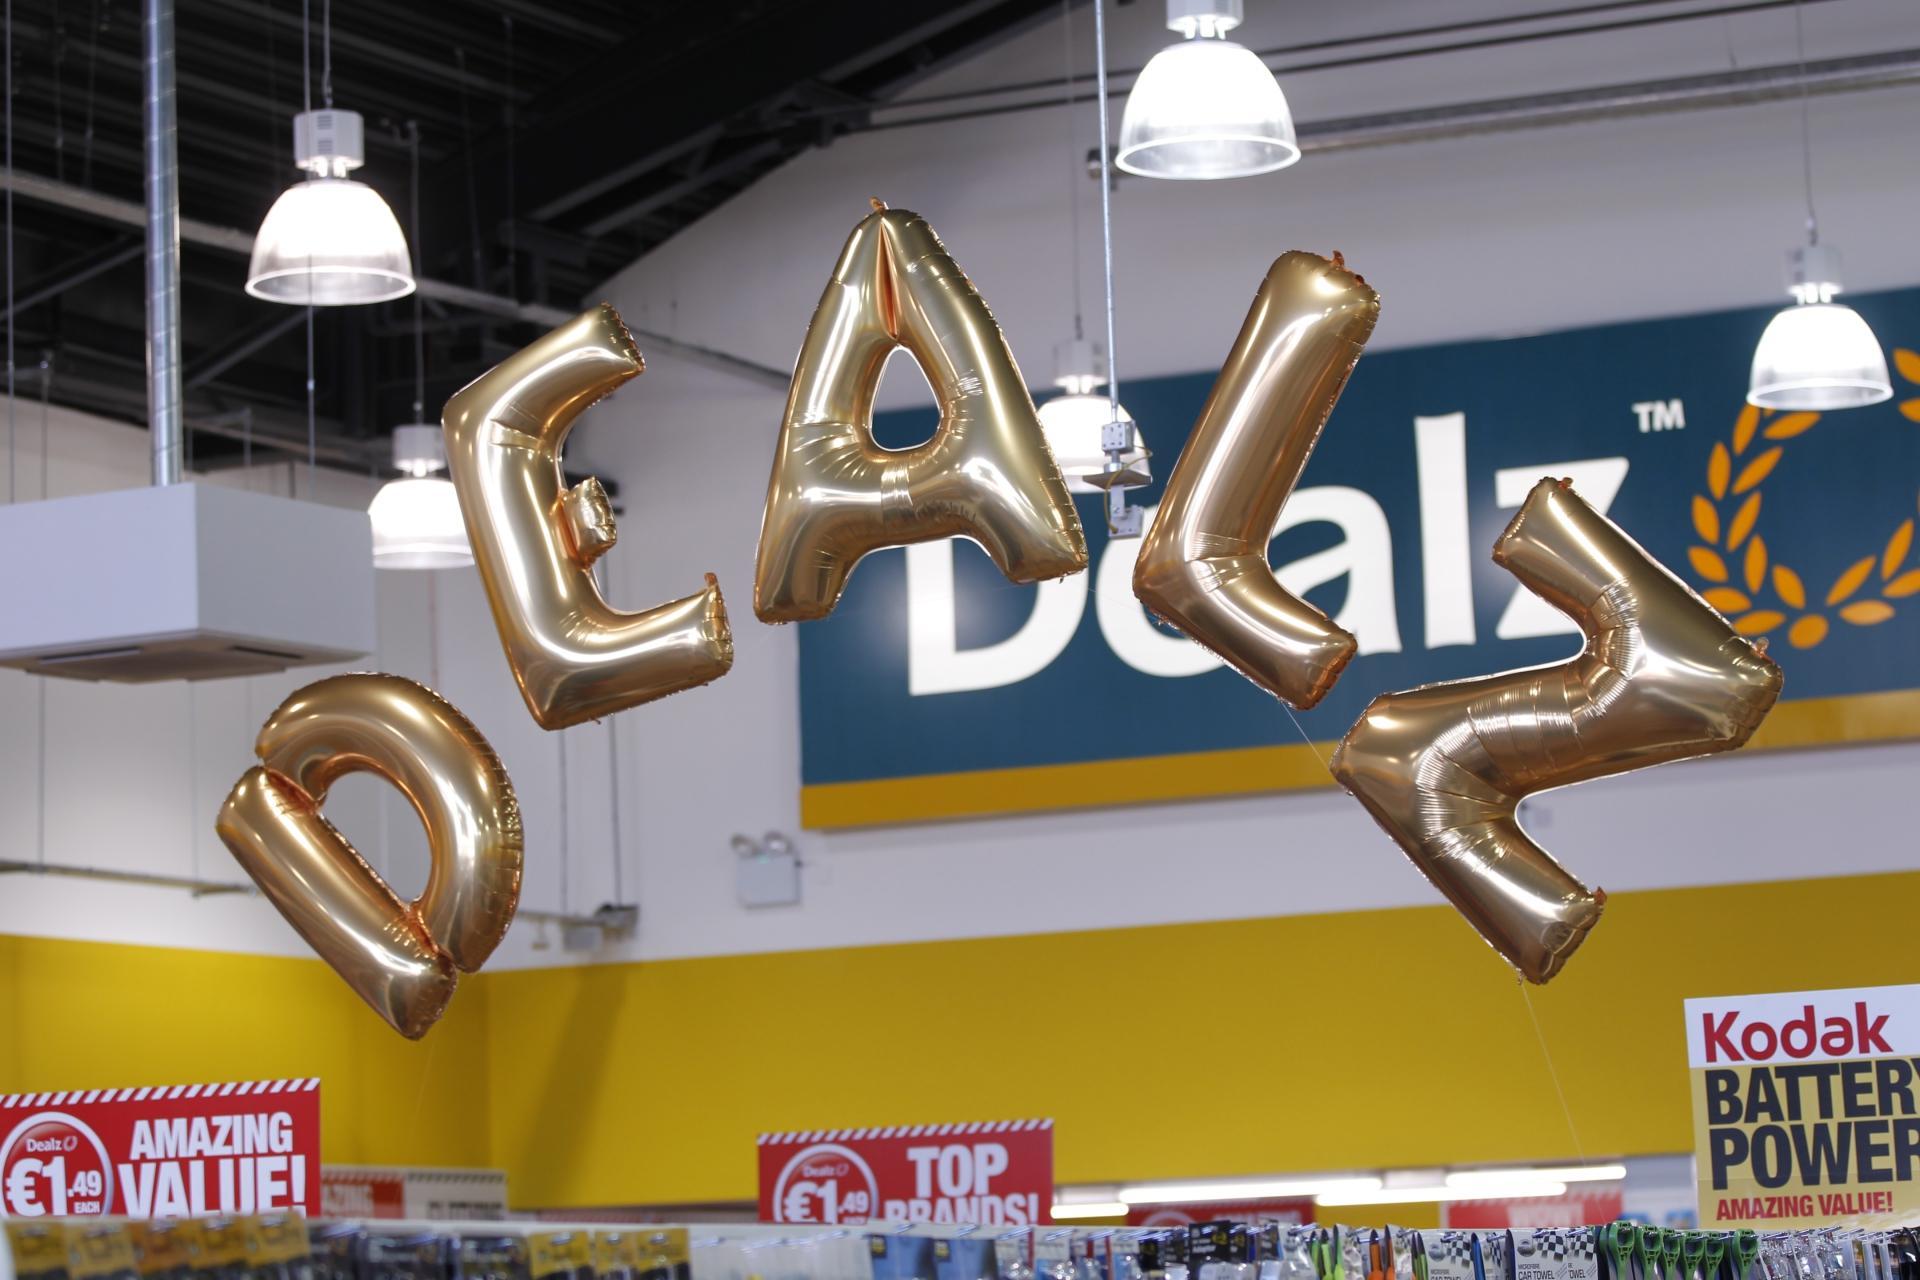 27 new jobs for Kilkenny as Dealz opens new store - Kilkenny People